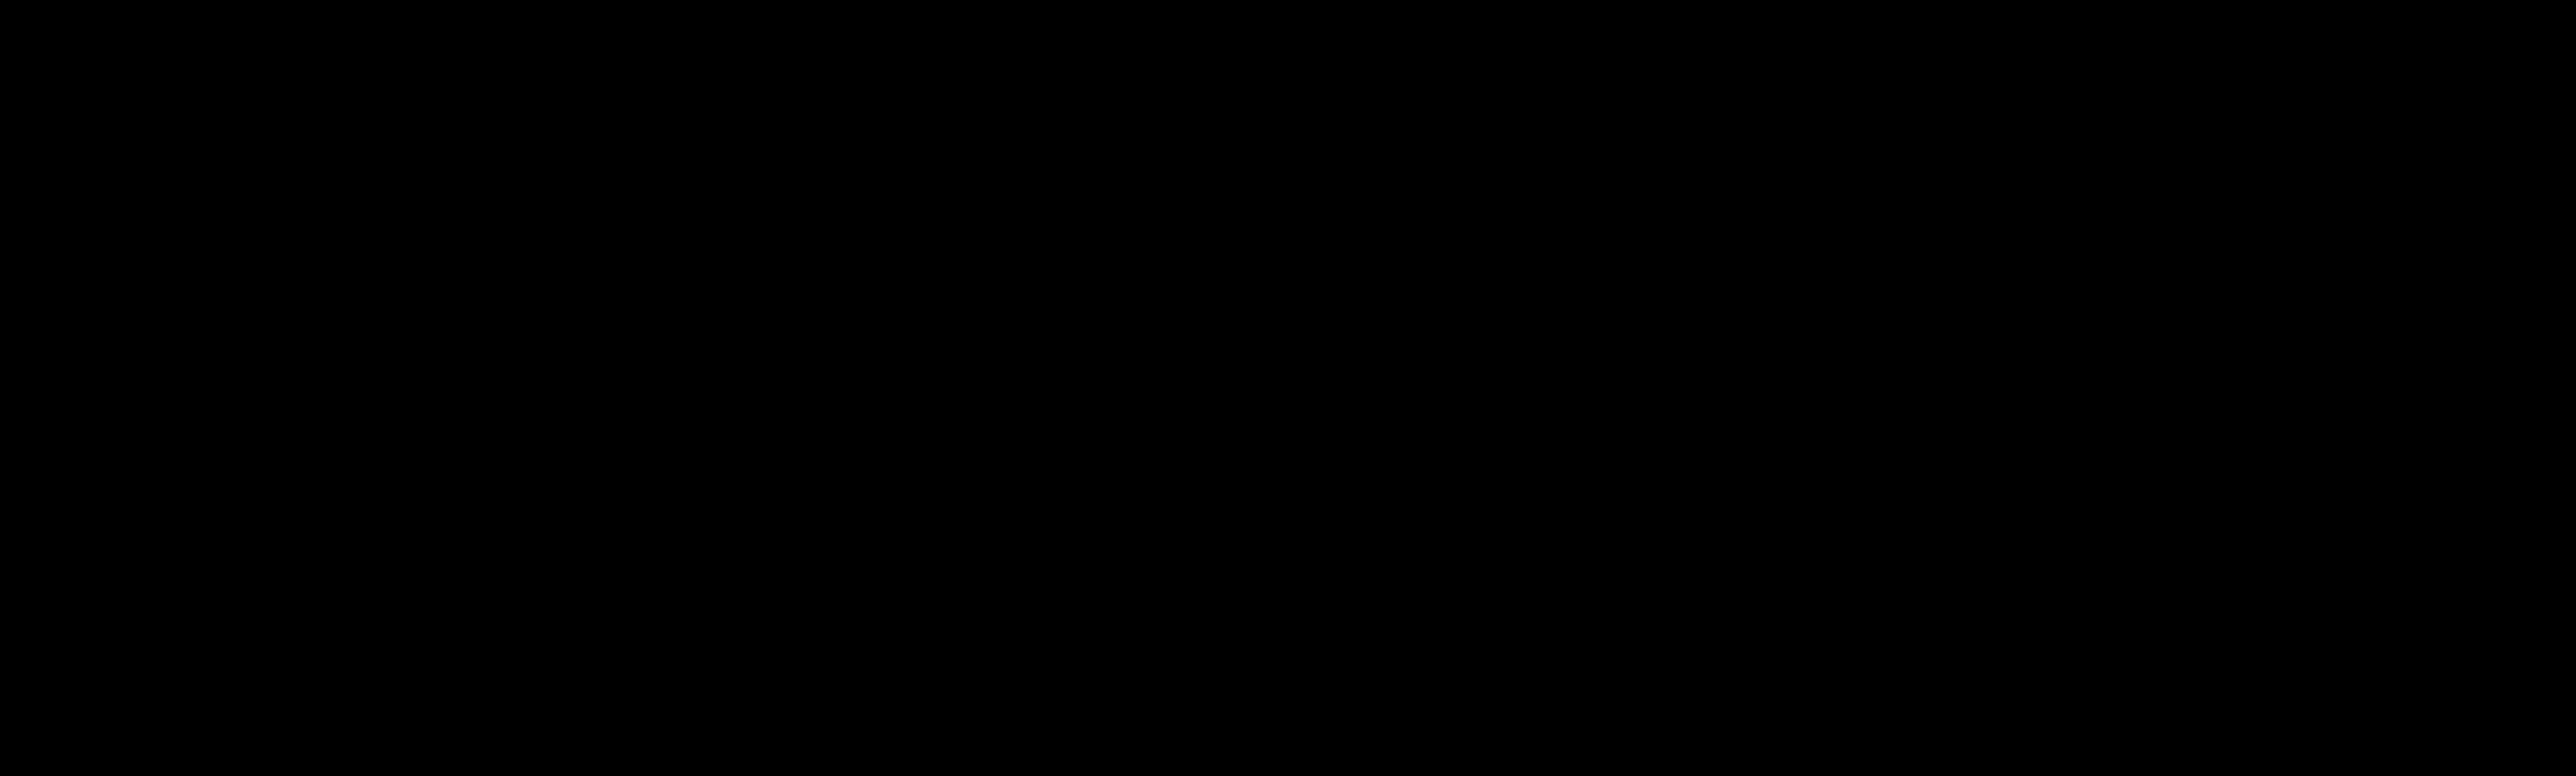 baner png